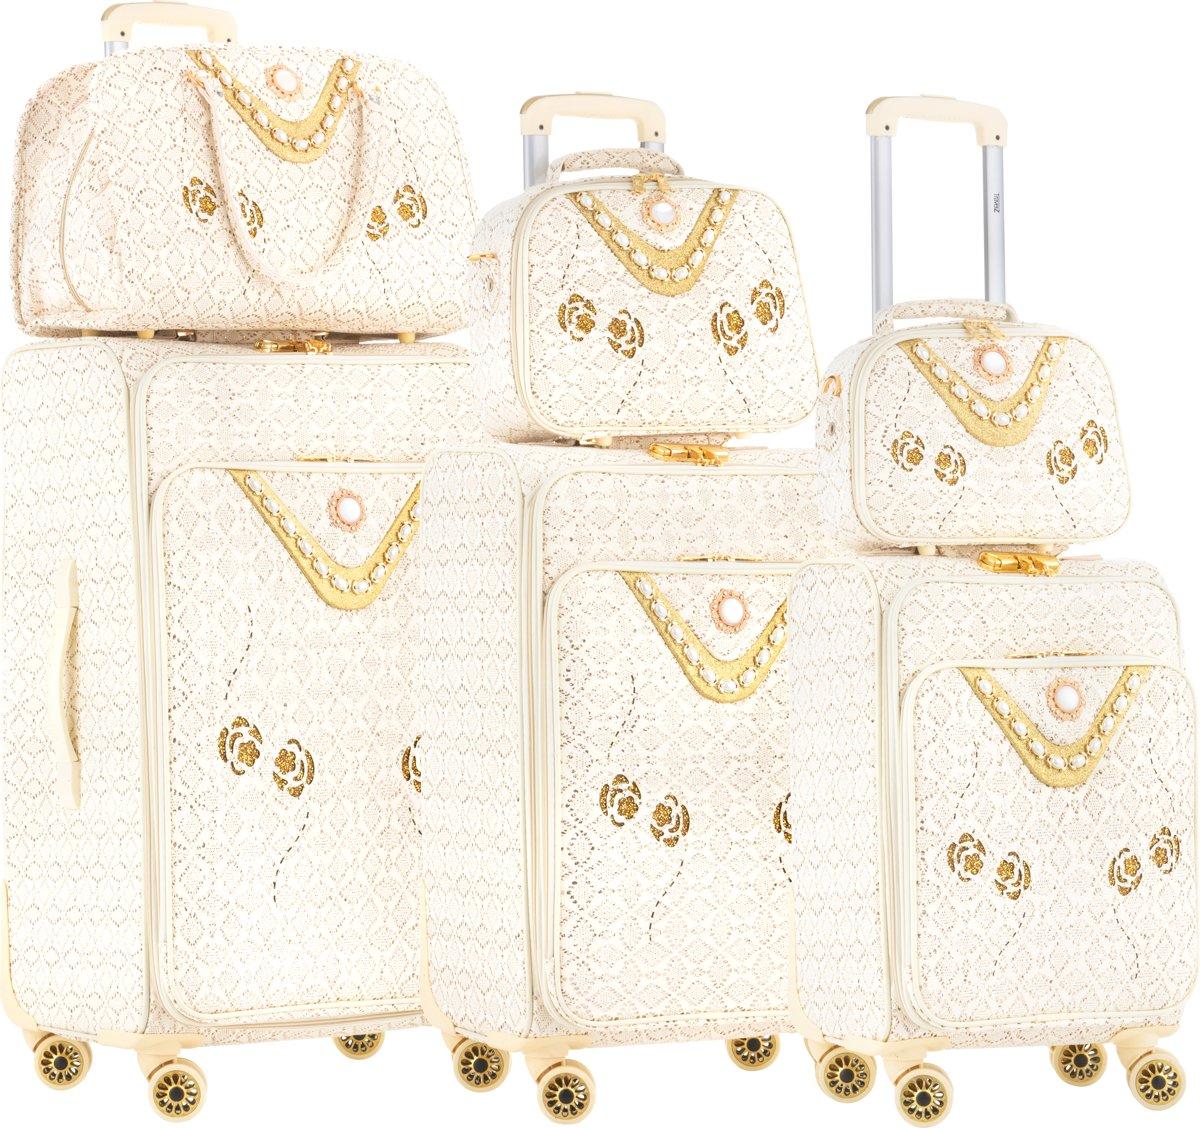 TravelZ BlingBling Yasmine Kofferset - 6-delige Trolleyset - Beautycase - Reistas - Koffers met dubbele wielen en slot -  Goud kopen